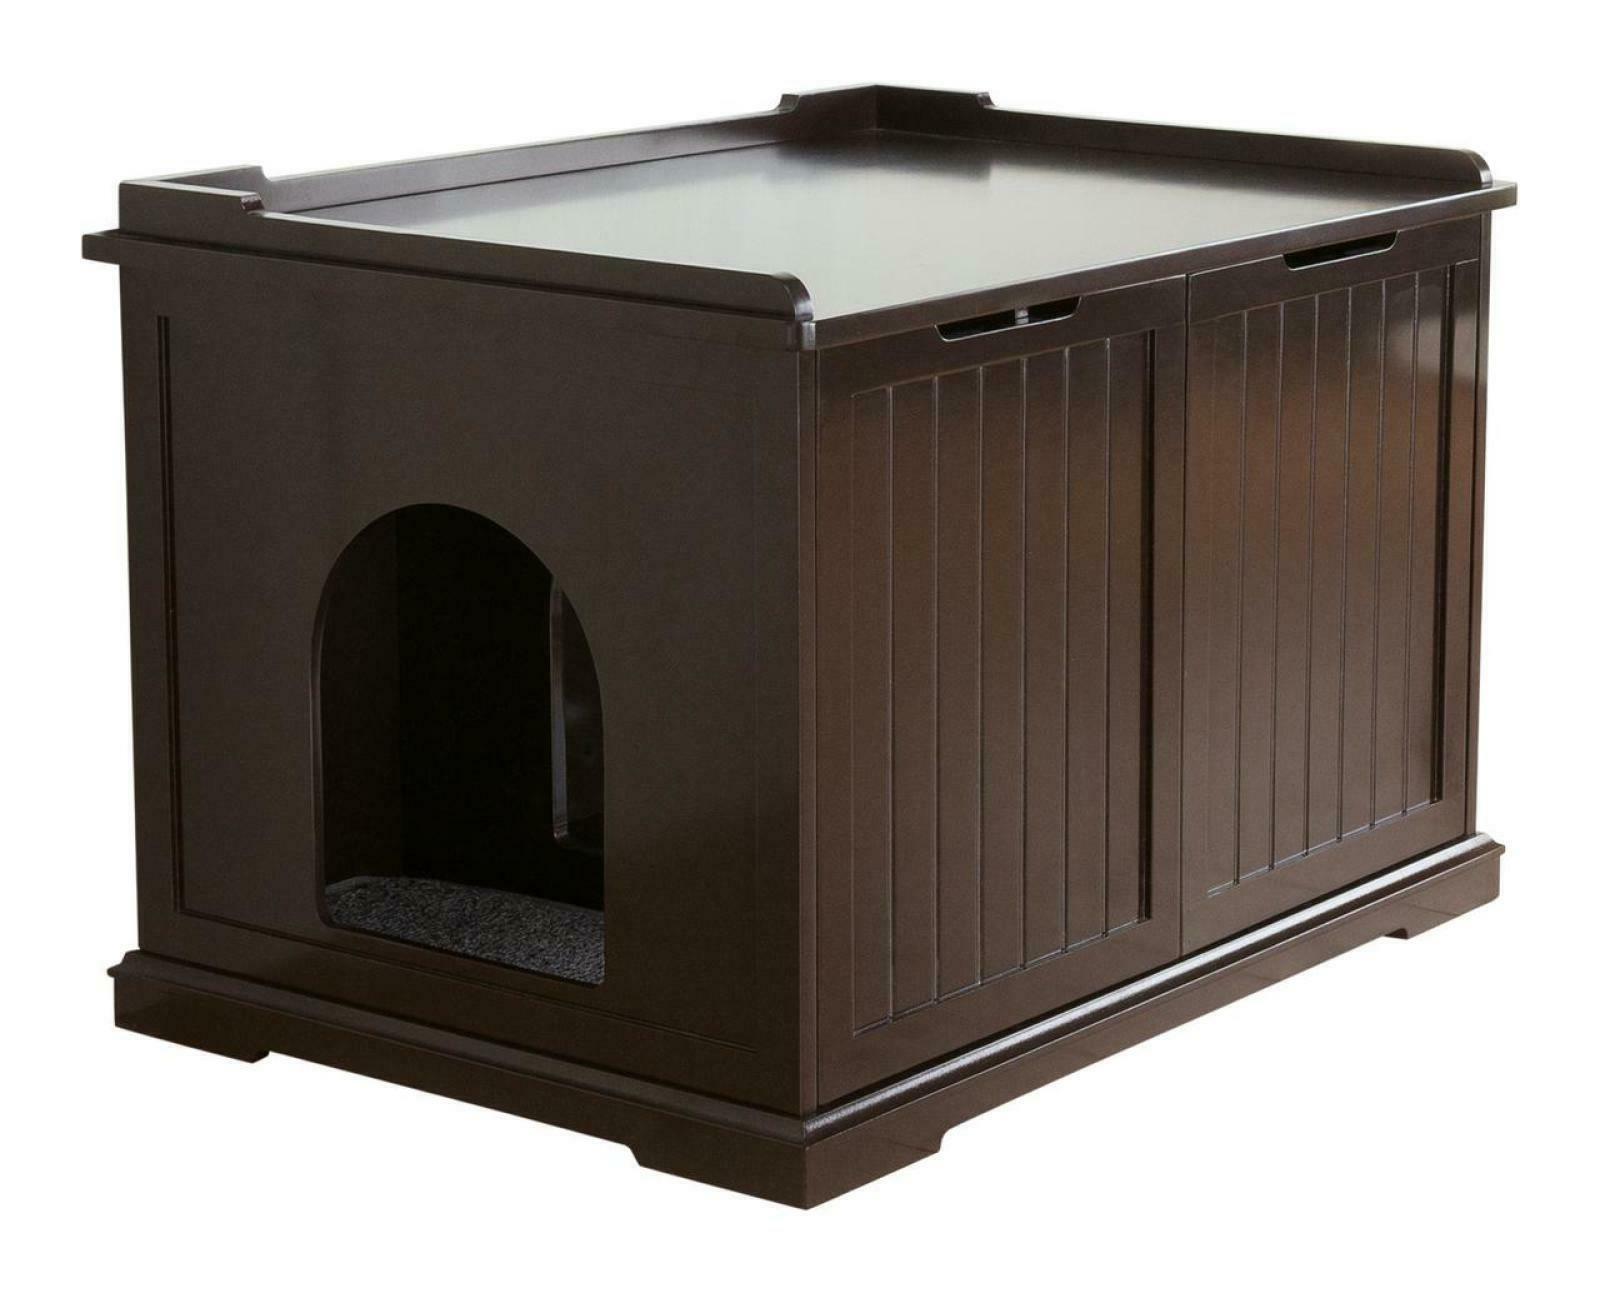 Litter Box Enclosure Furniture Indoor Cat Kitty Pet Home Woo